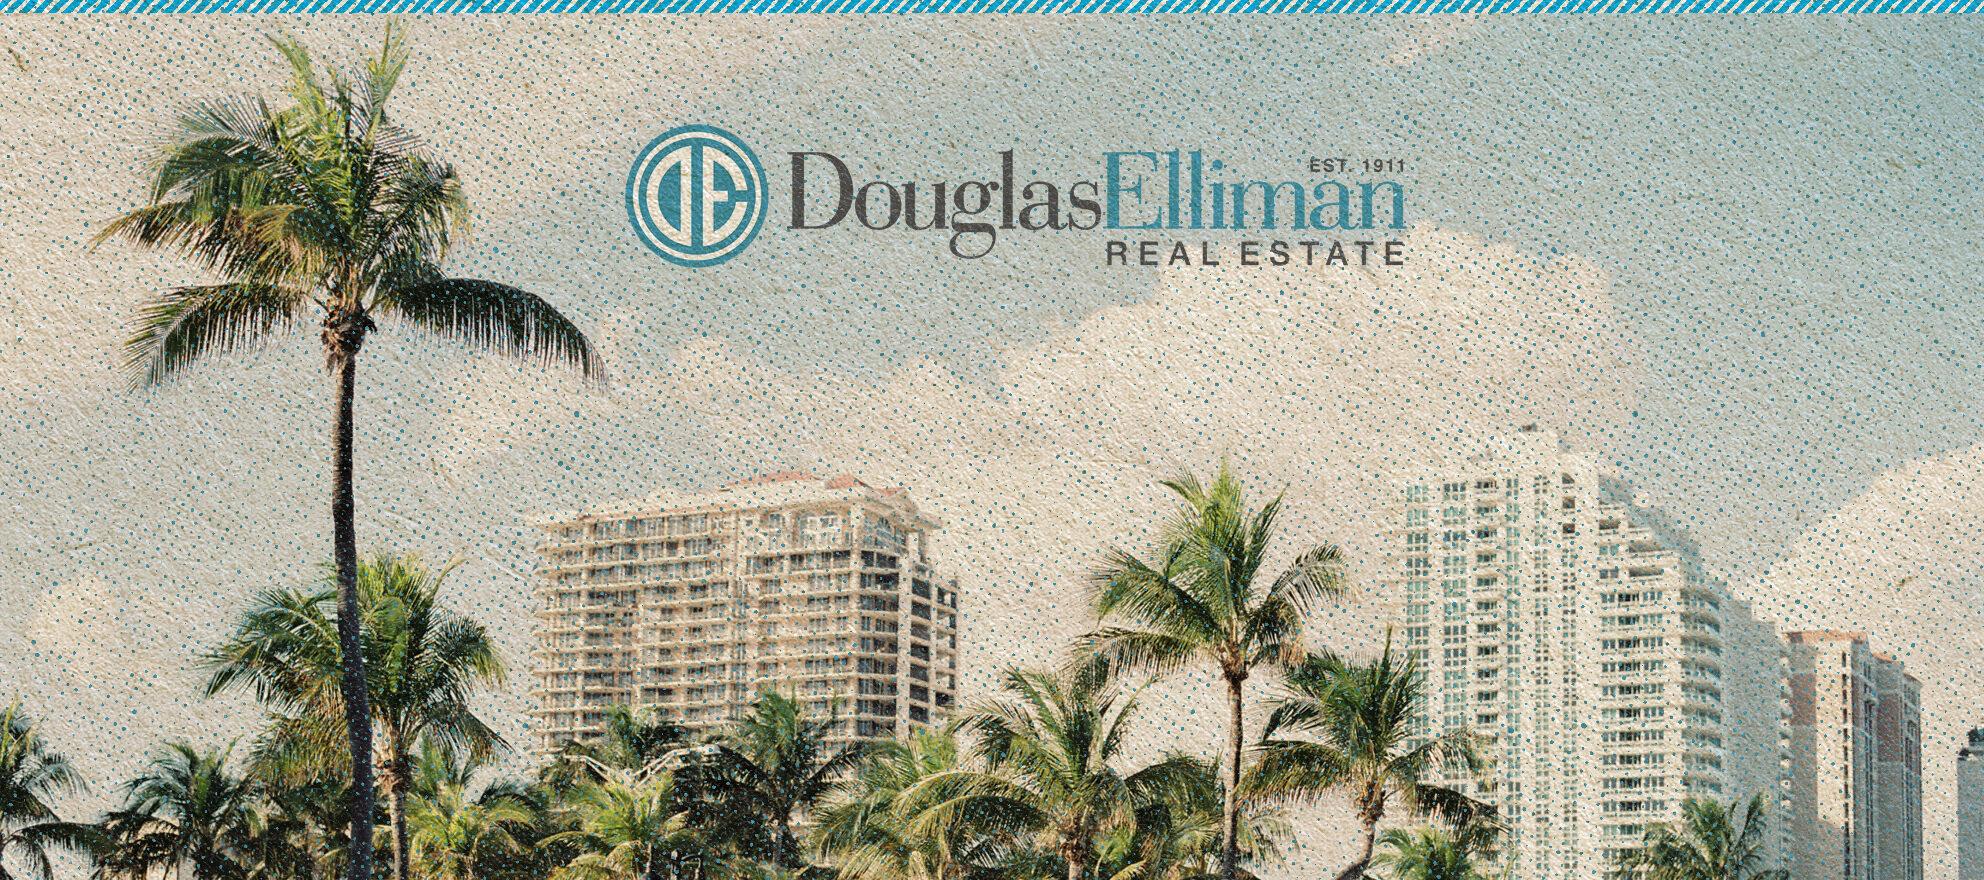 Douglas Elliman agent deceived seller in dual agency deal: Lawsuit